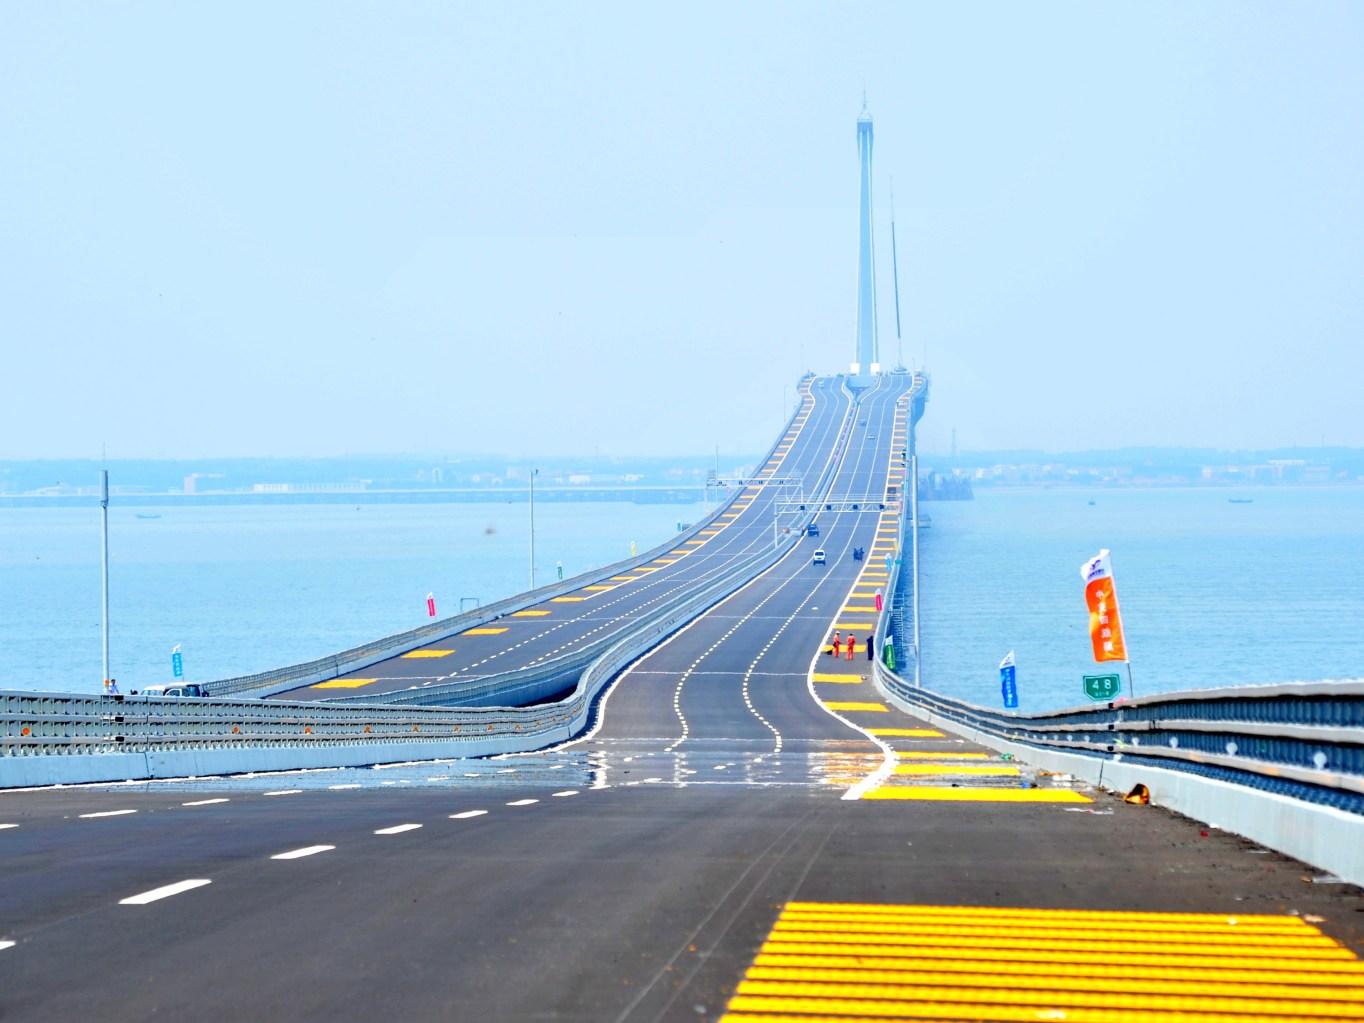 Qingdao: Qingdao boasts the world's longest sea bridge, which spans  26.4 miles across Jiaozhou Bay and cost more than $1.5 billion to build. Here, Qingdao Jiaozhou Bay Bridge can be seen three days before its June 30, 2011, opening.